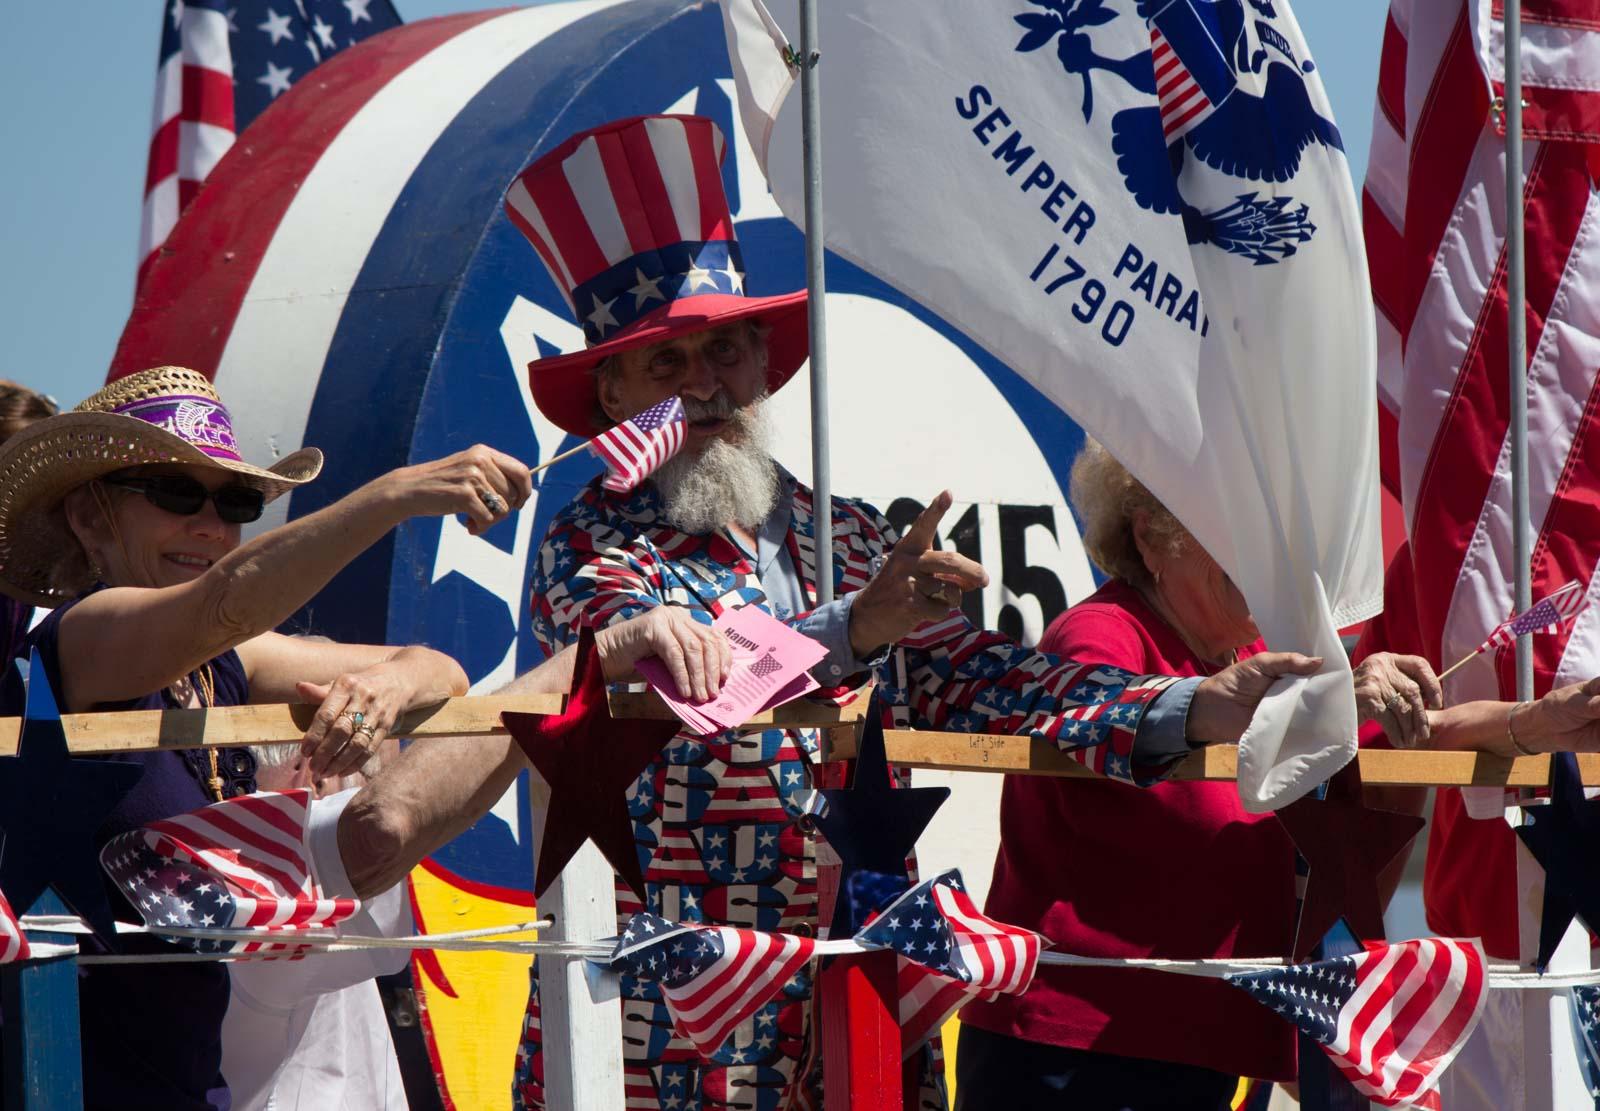 Alameda 4th of July parade, USA